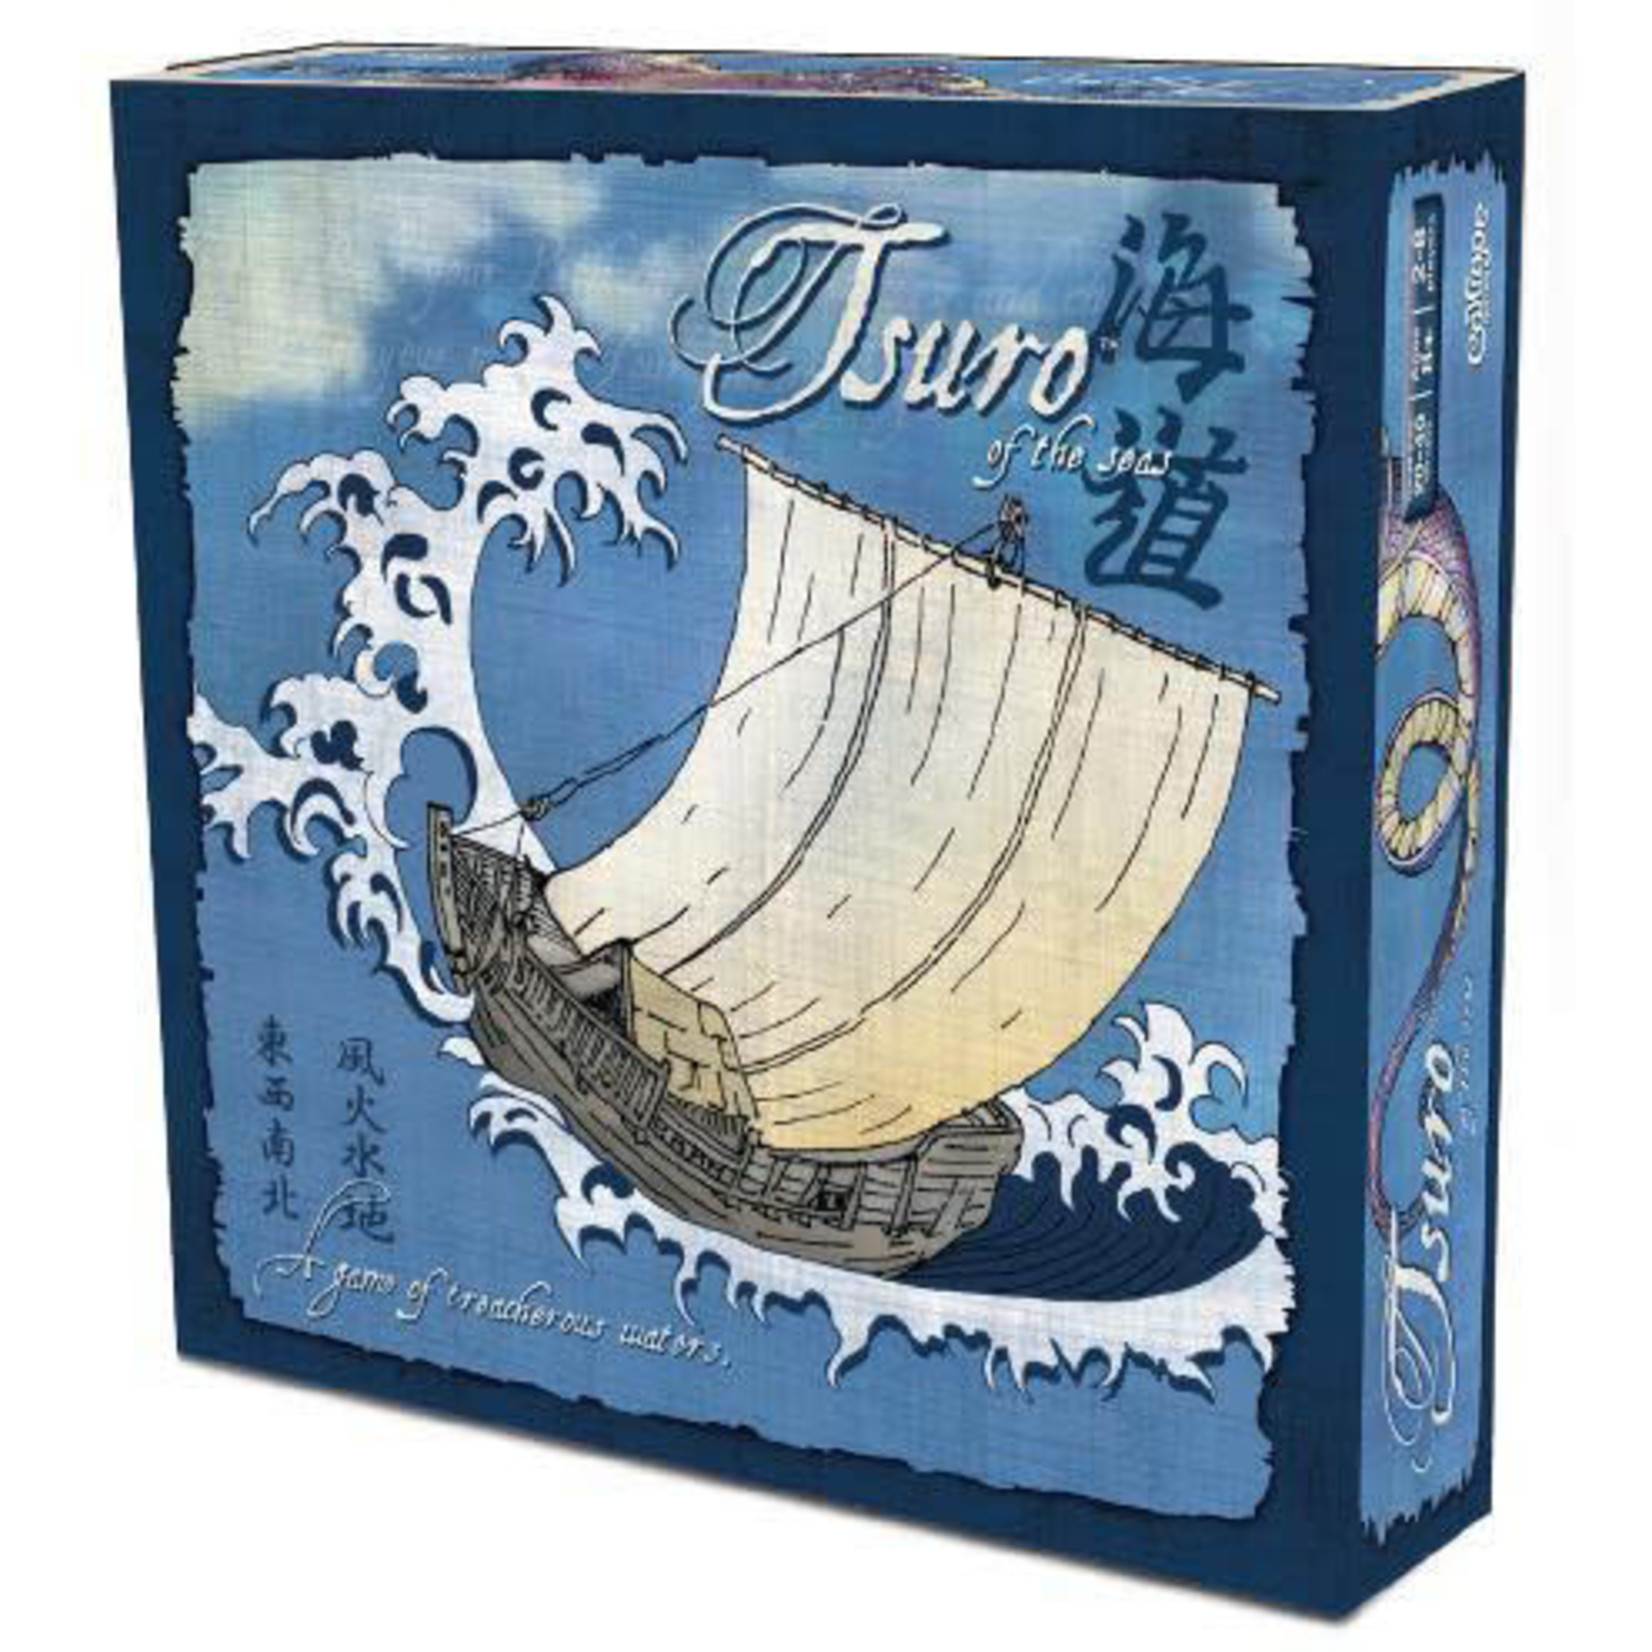 Tsuro of the Seas